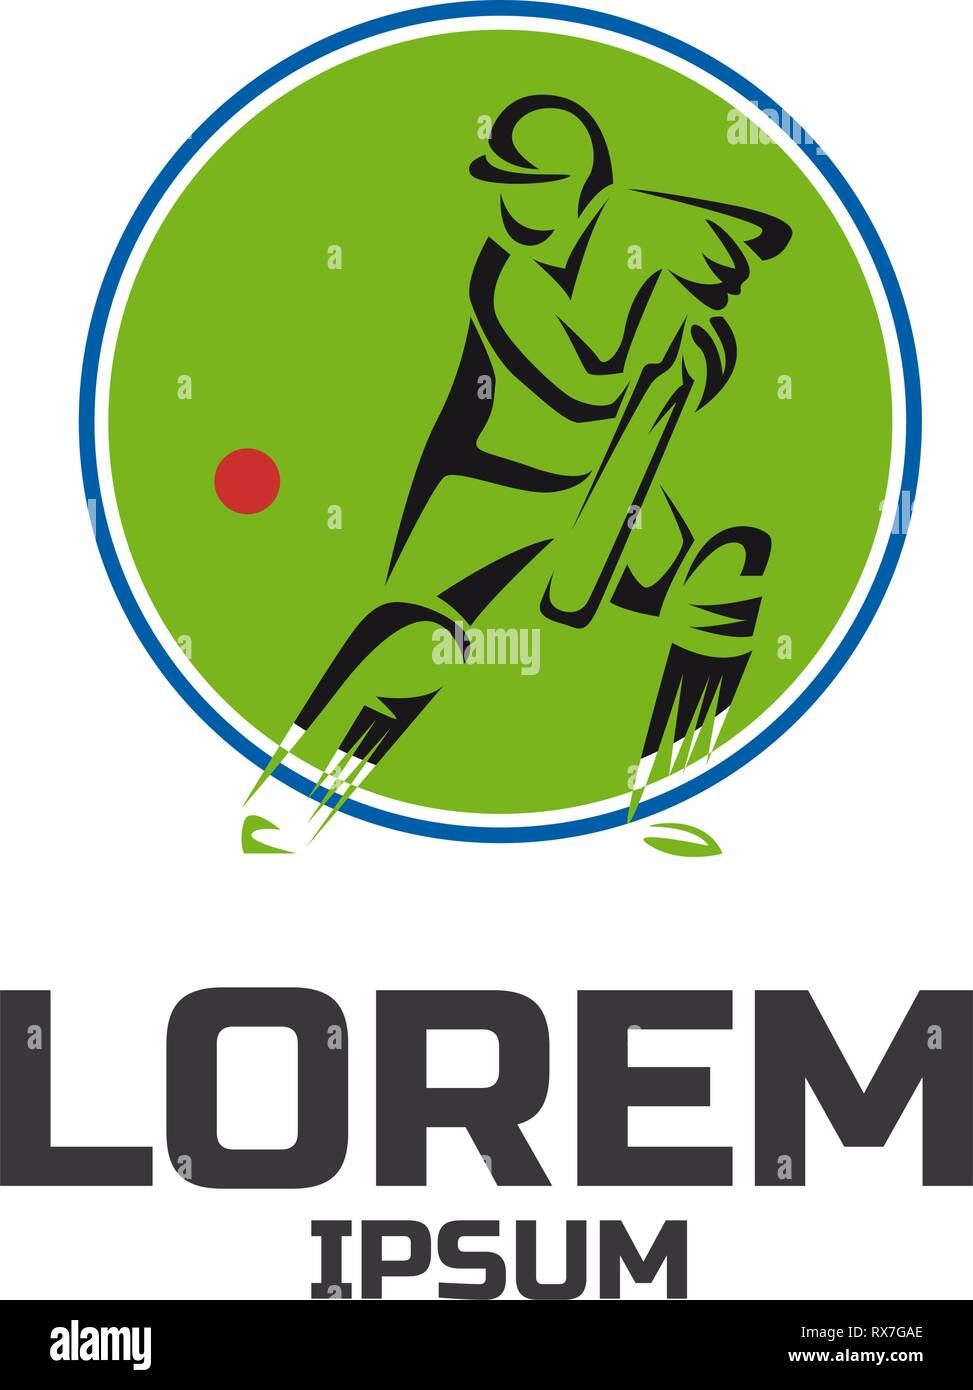 Cricket Sport Vector Logo Design Template Stock Vector Image Art Alamy